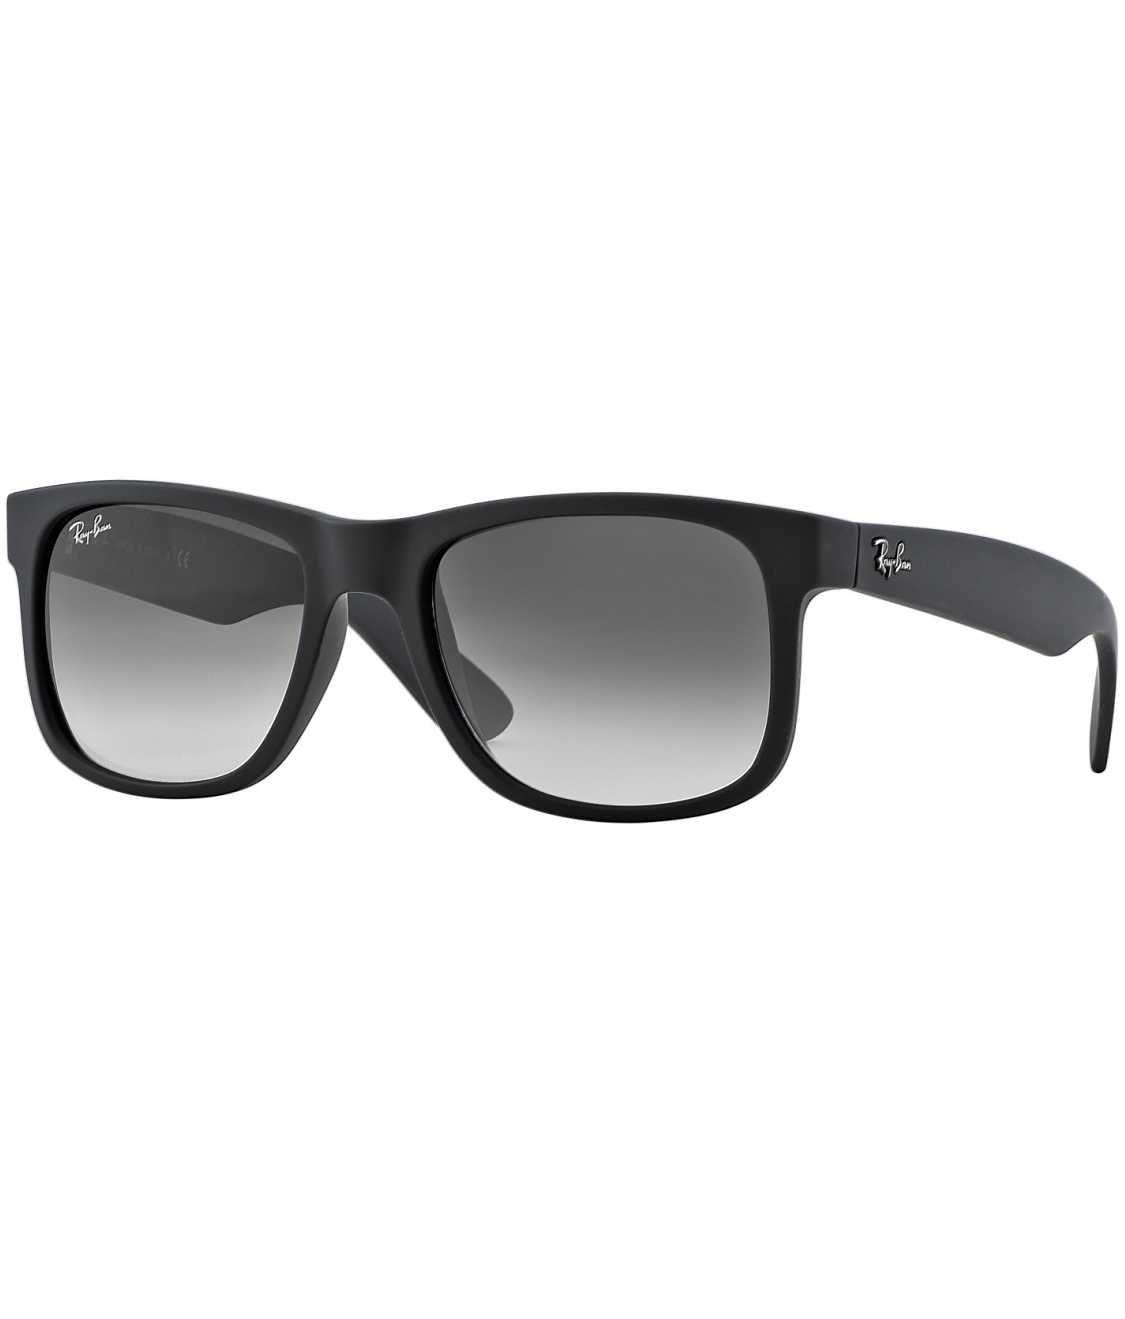 329dc5635f Ray-Ban® Justin Sunglasses - Men s Accessories in Black Gradient ...